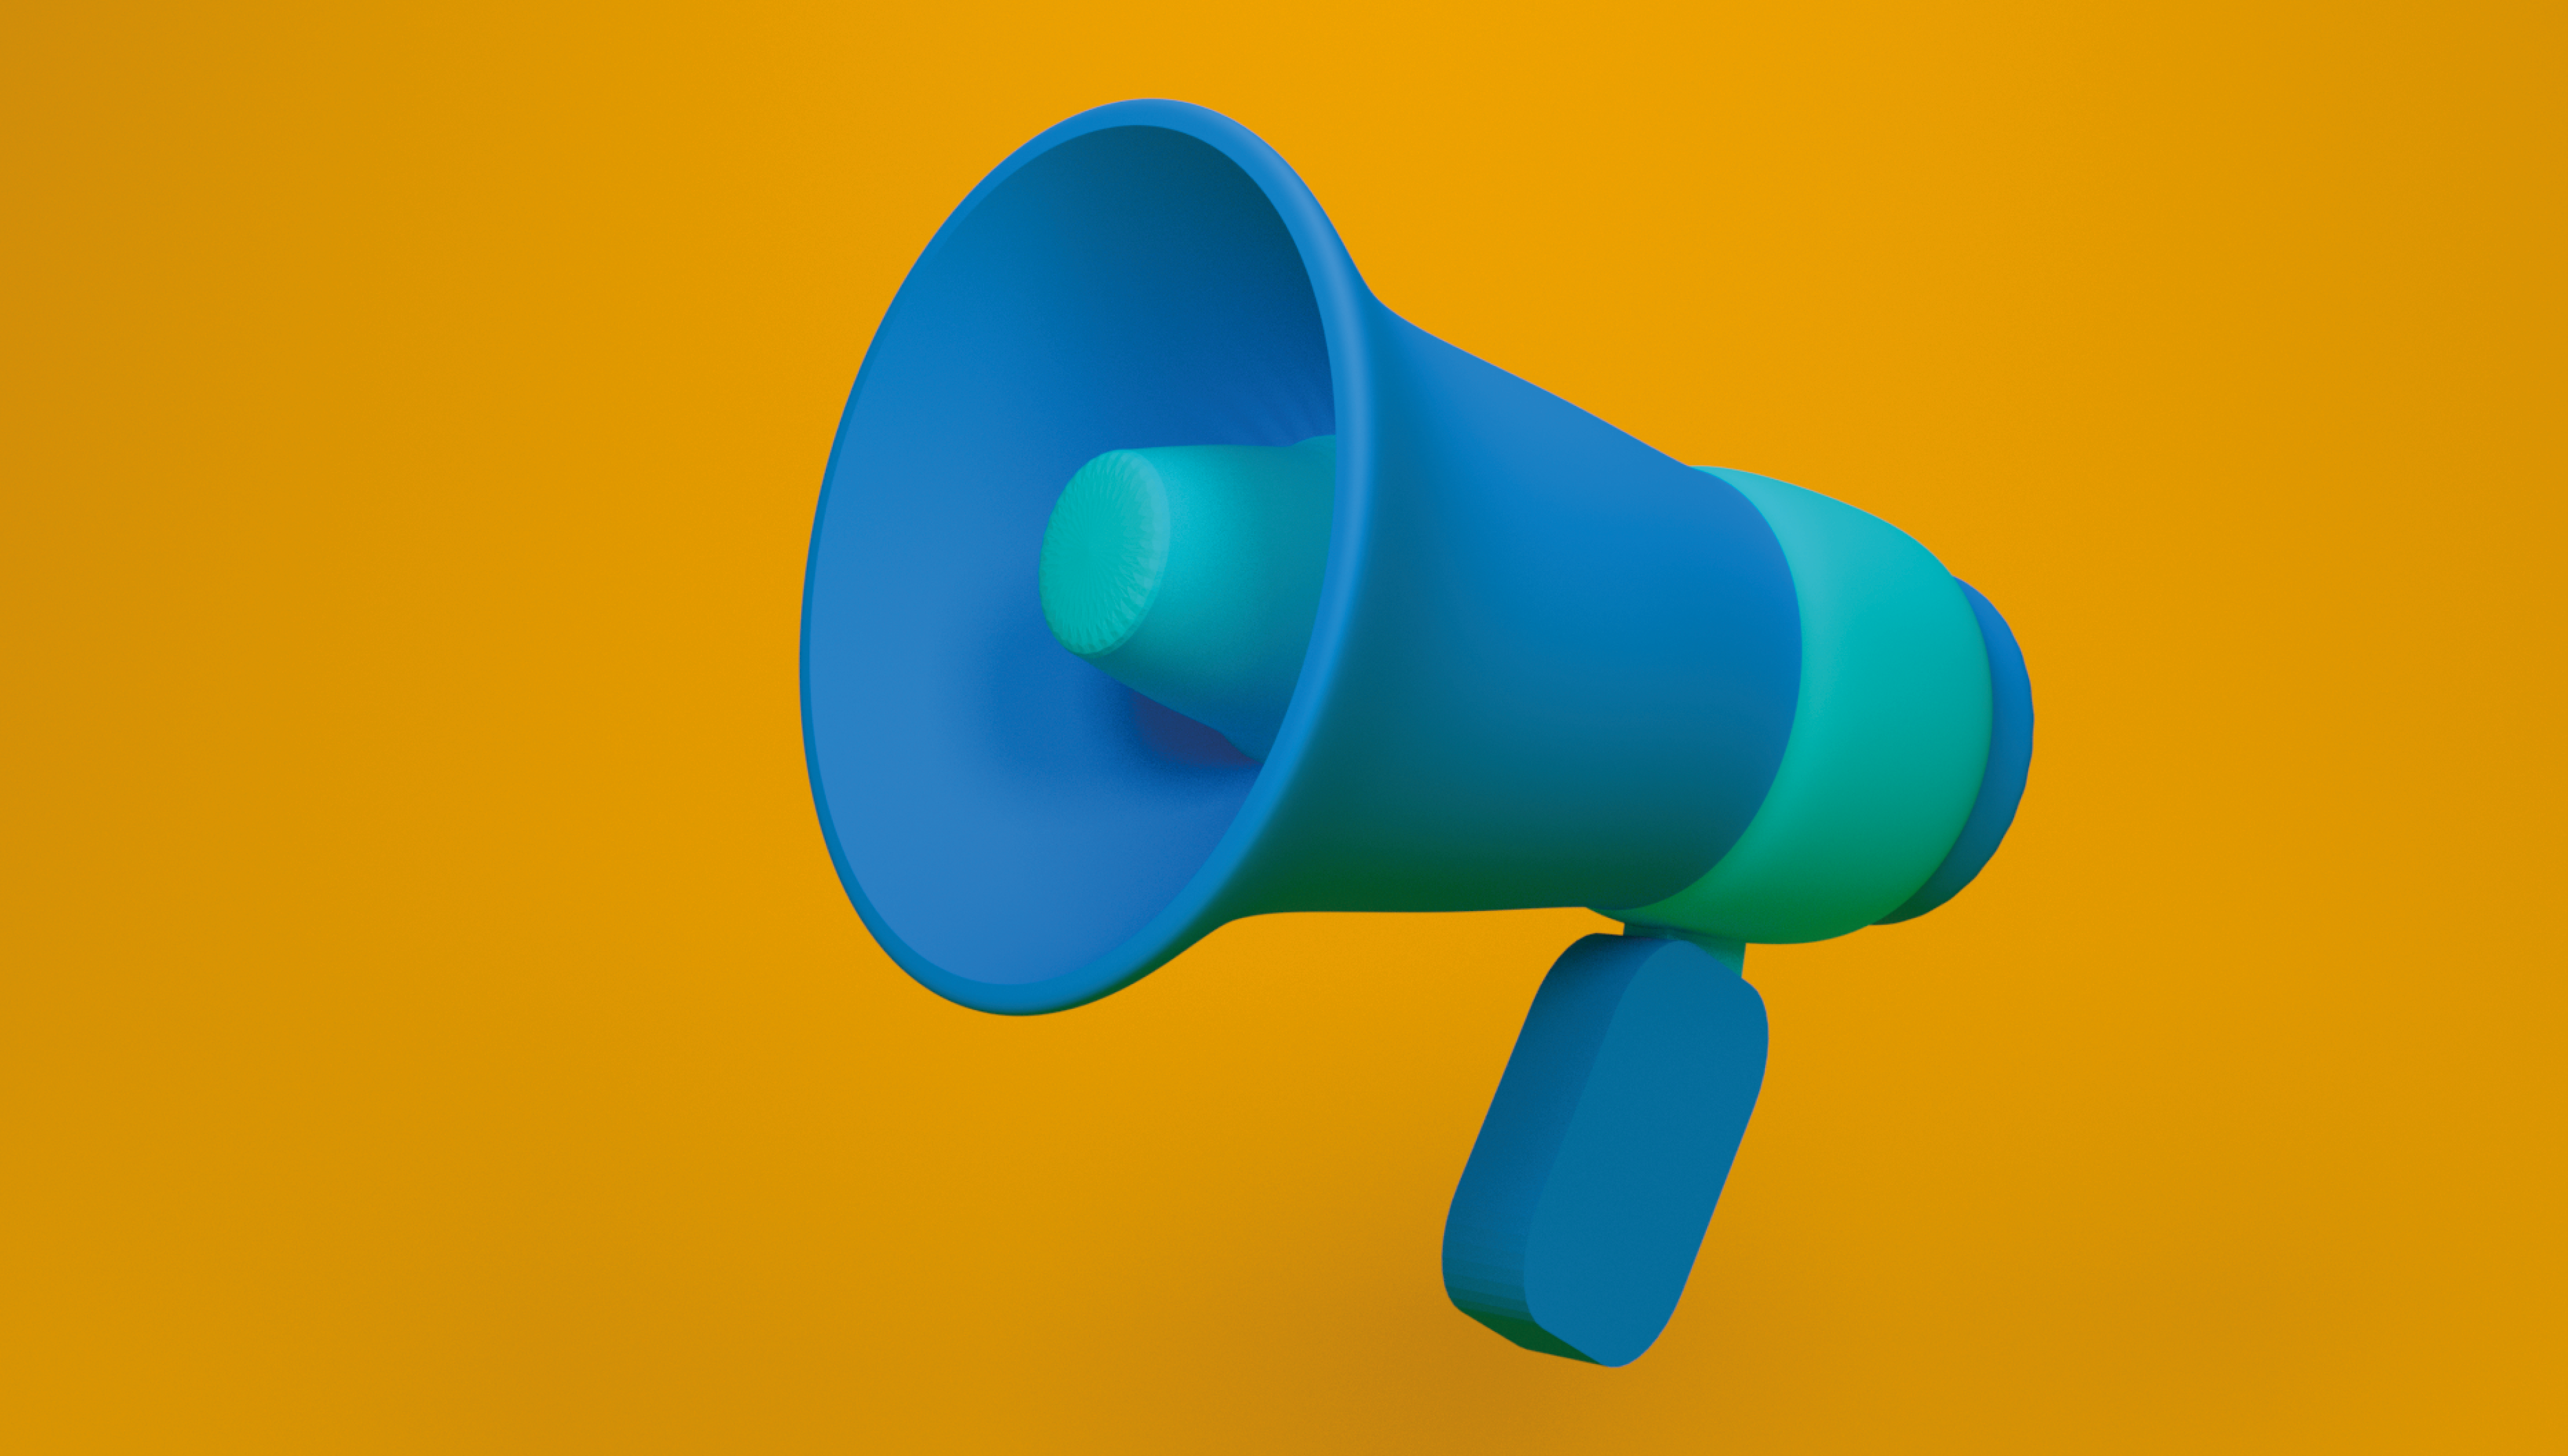 Business brand megaphone